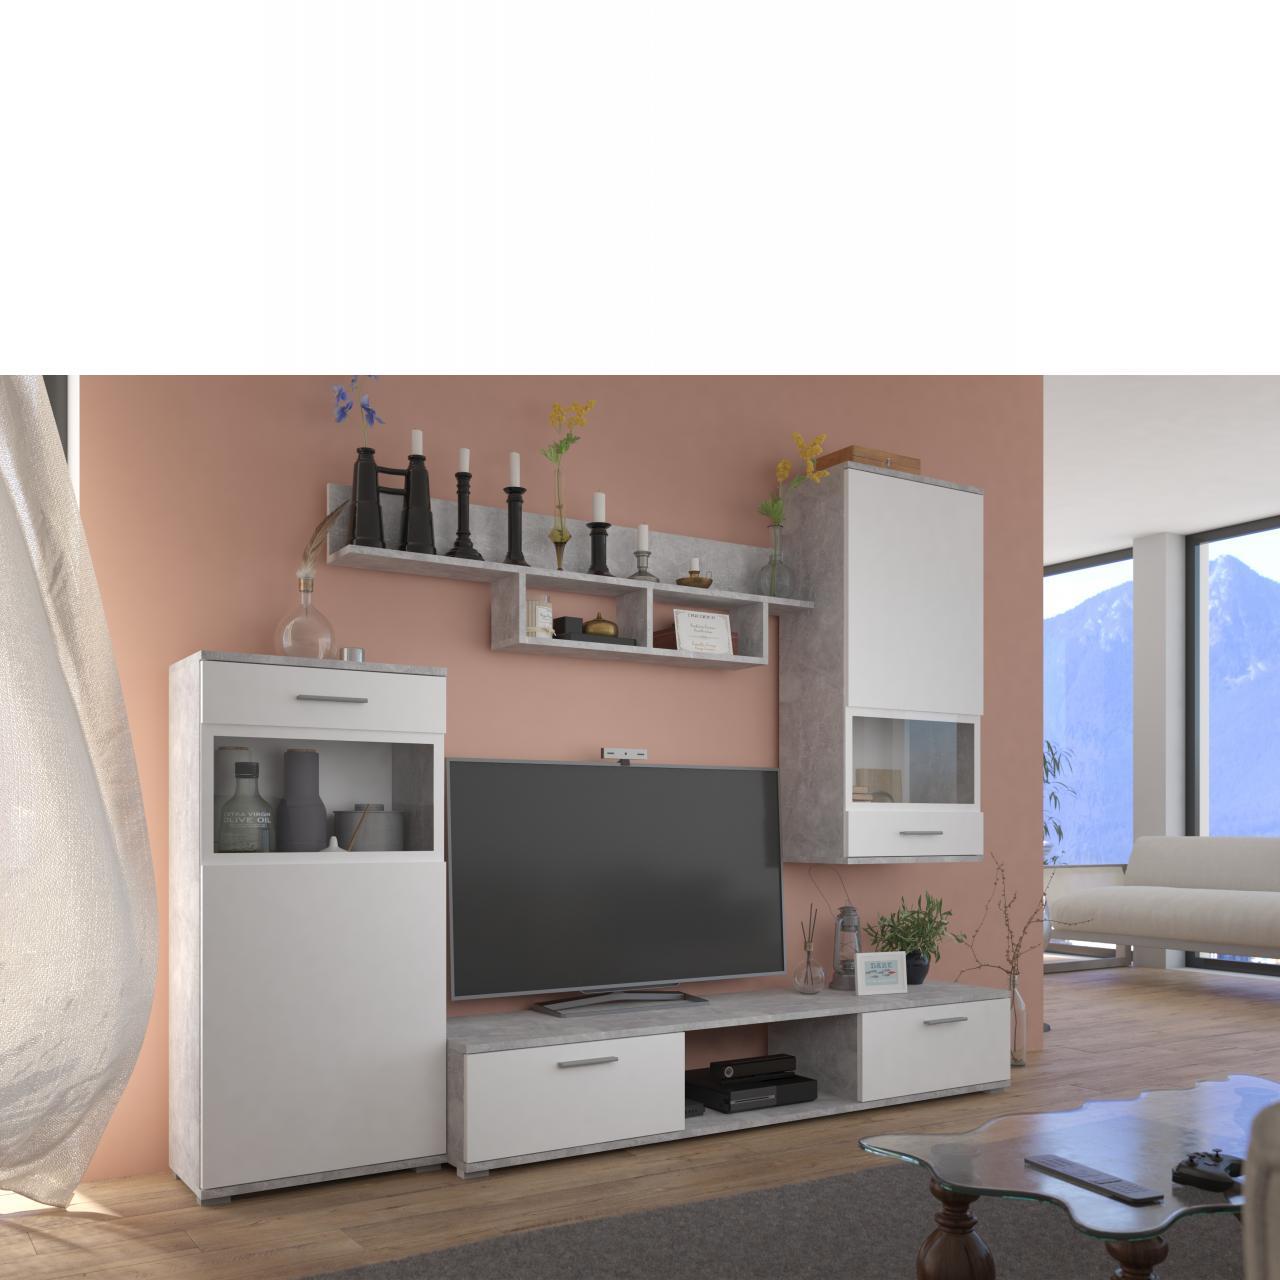 Wohnwand Blues 4 Tlg. Set Weiß Laminat Beton Tv-Lowboard Modern Anbauwand